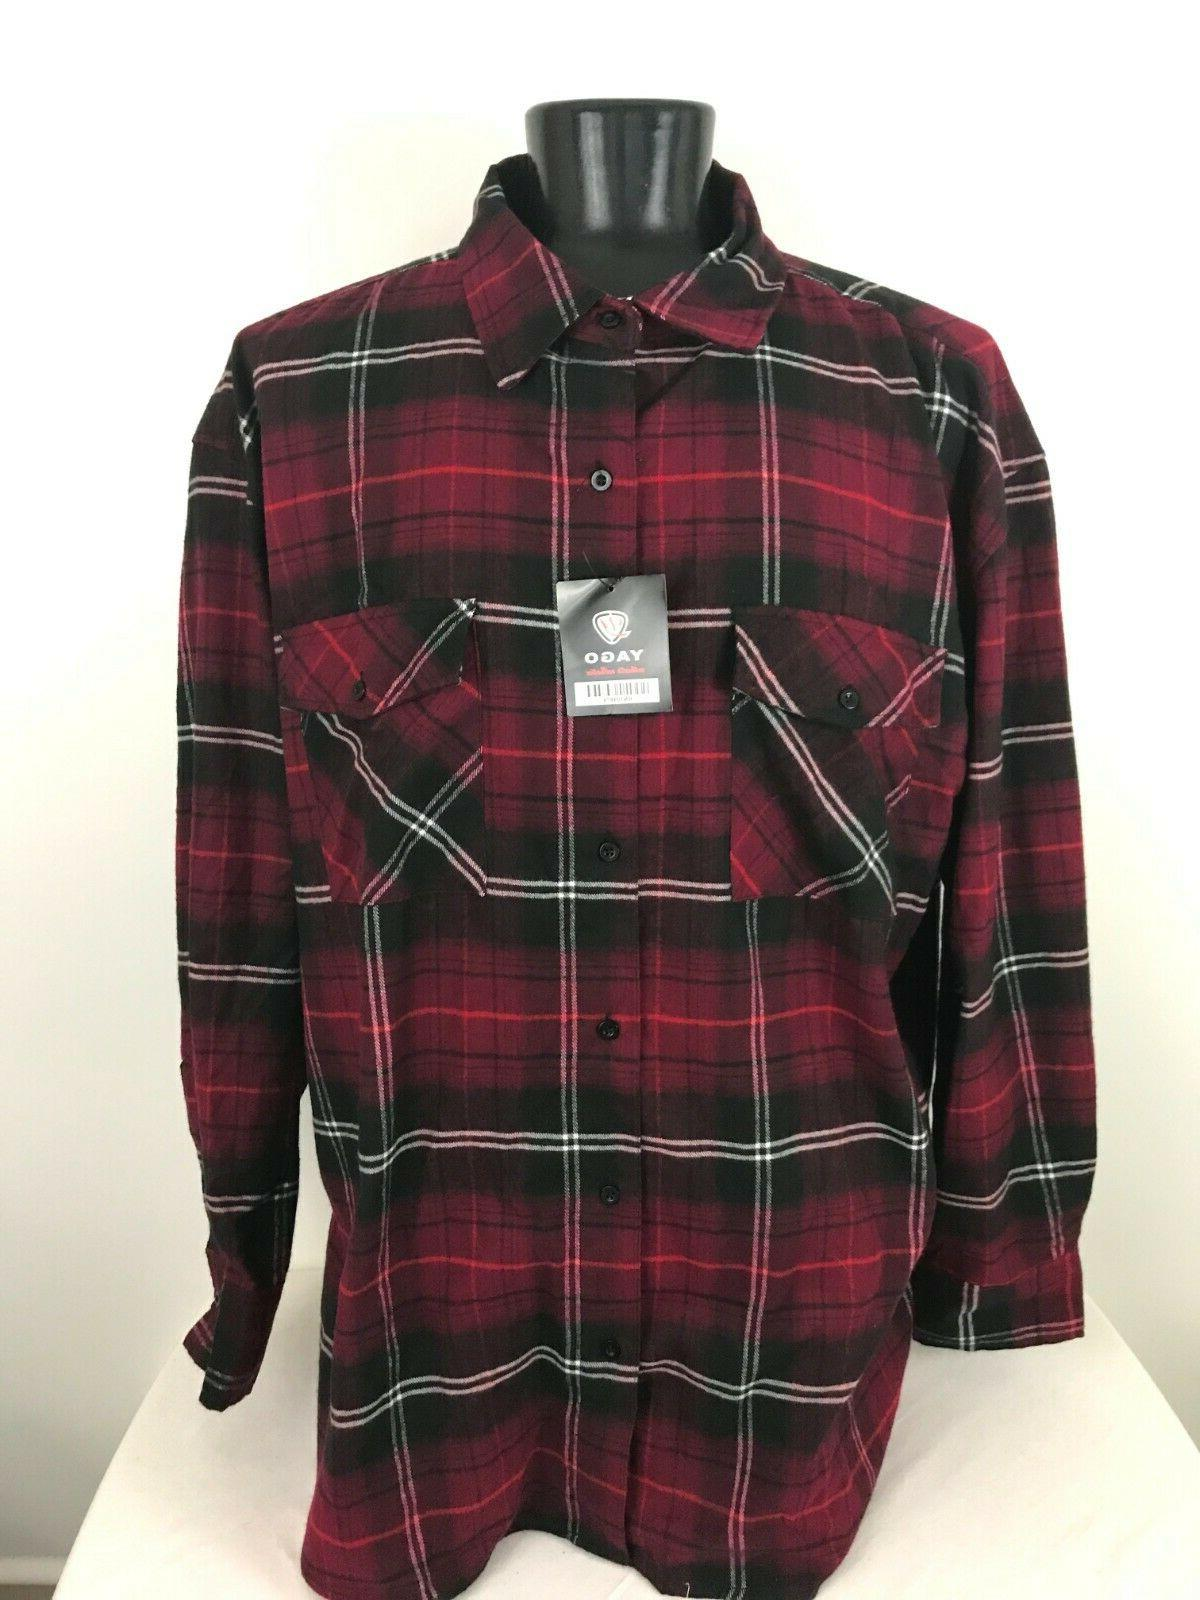 Yago Flannel Long Sleeve Shirt Plaid XXXXL